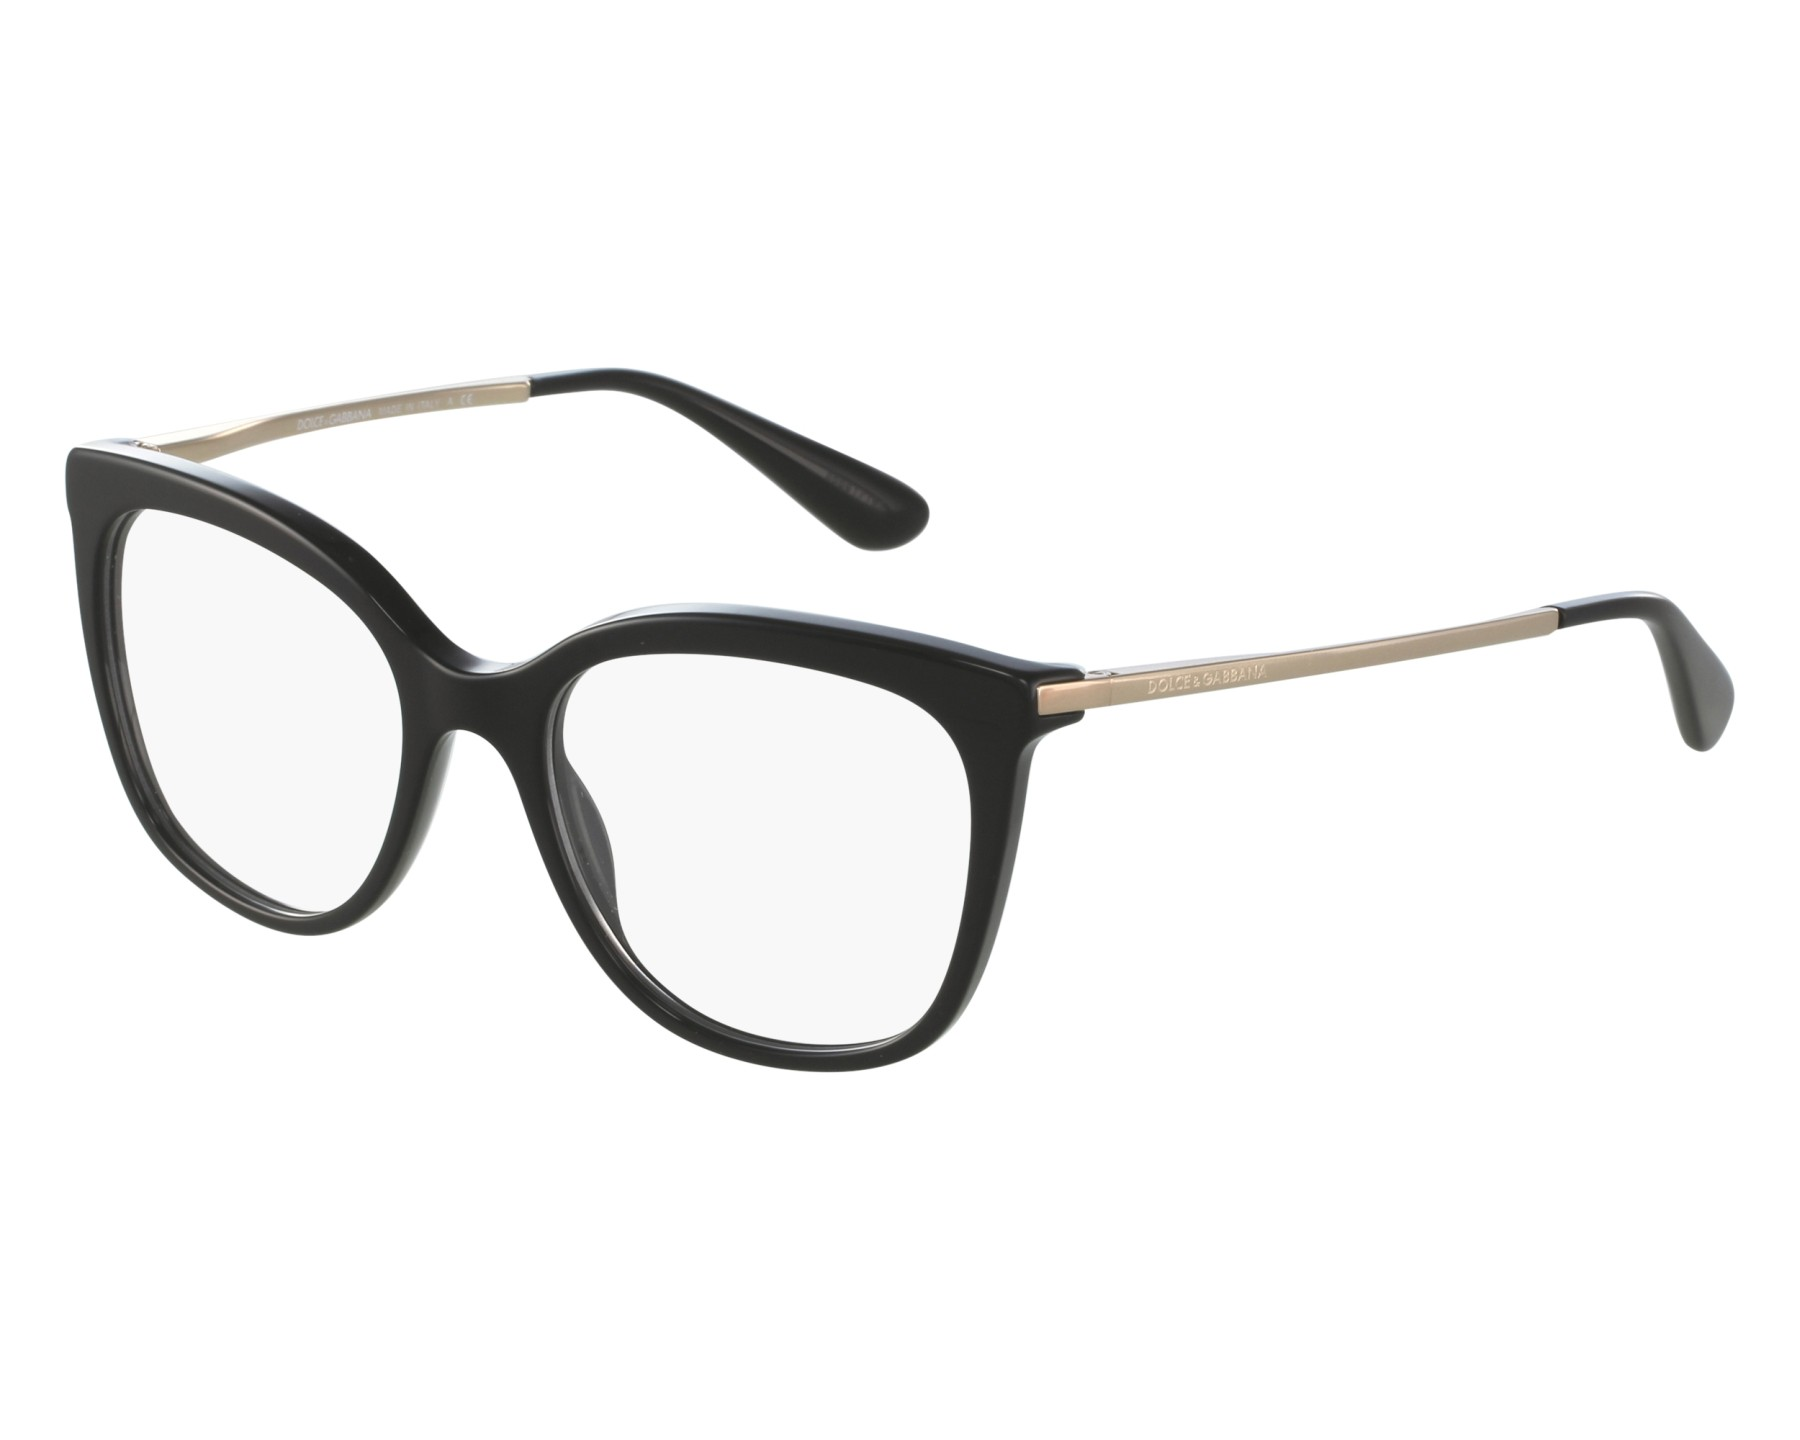 50028cfa55c eyeglasses Dolce   Gabbana DG-3259 501 51-17 Black Gold front view